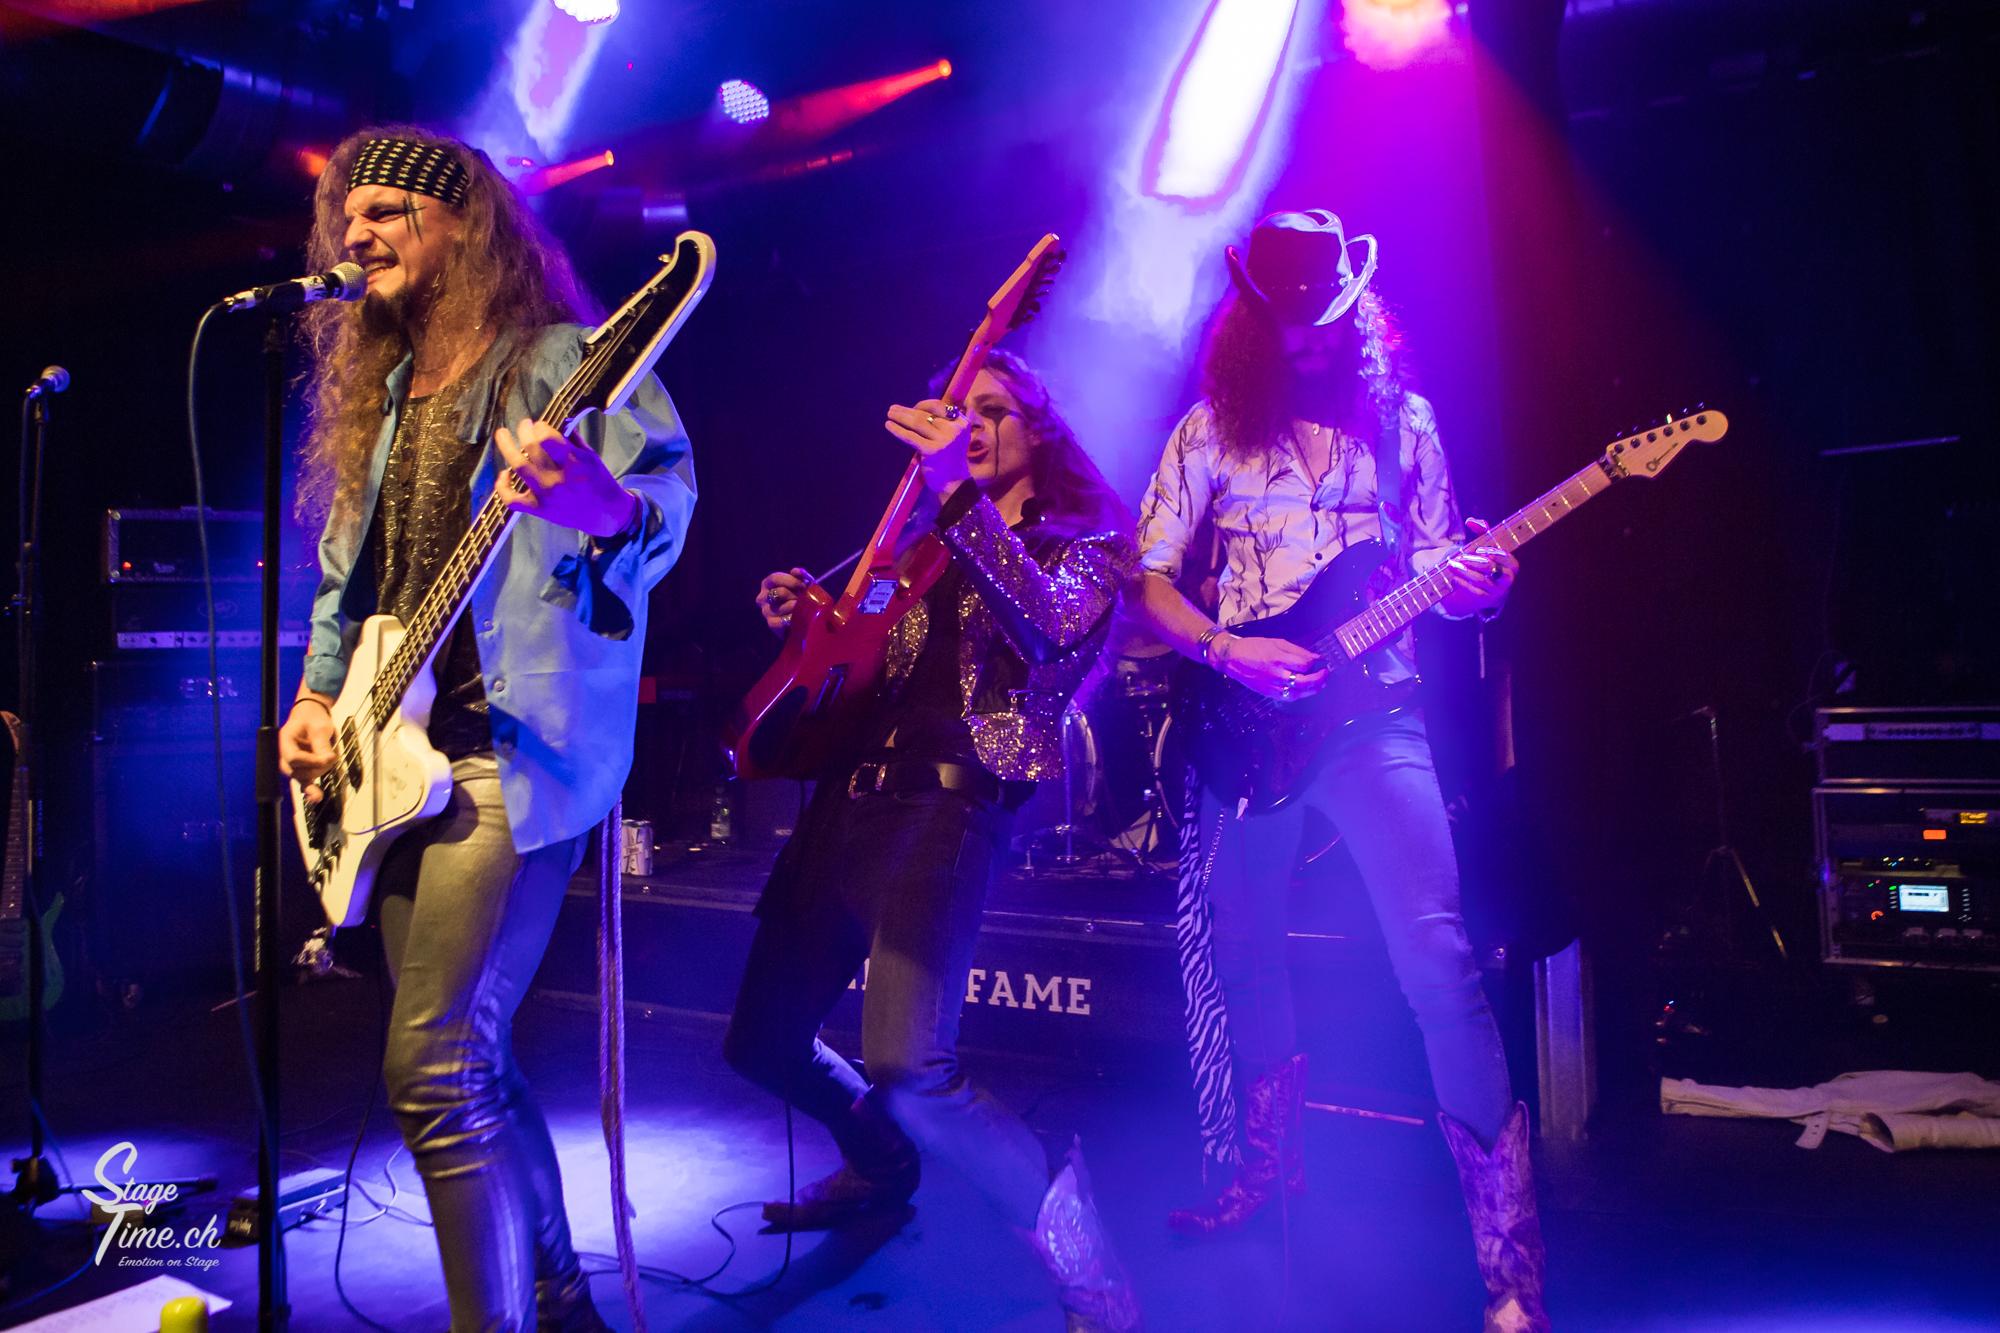 Rusted_Guns___1st_Swiss_Glam_Rock_Fest-1